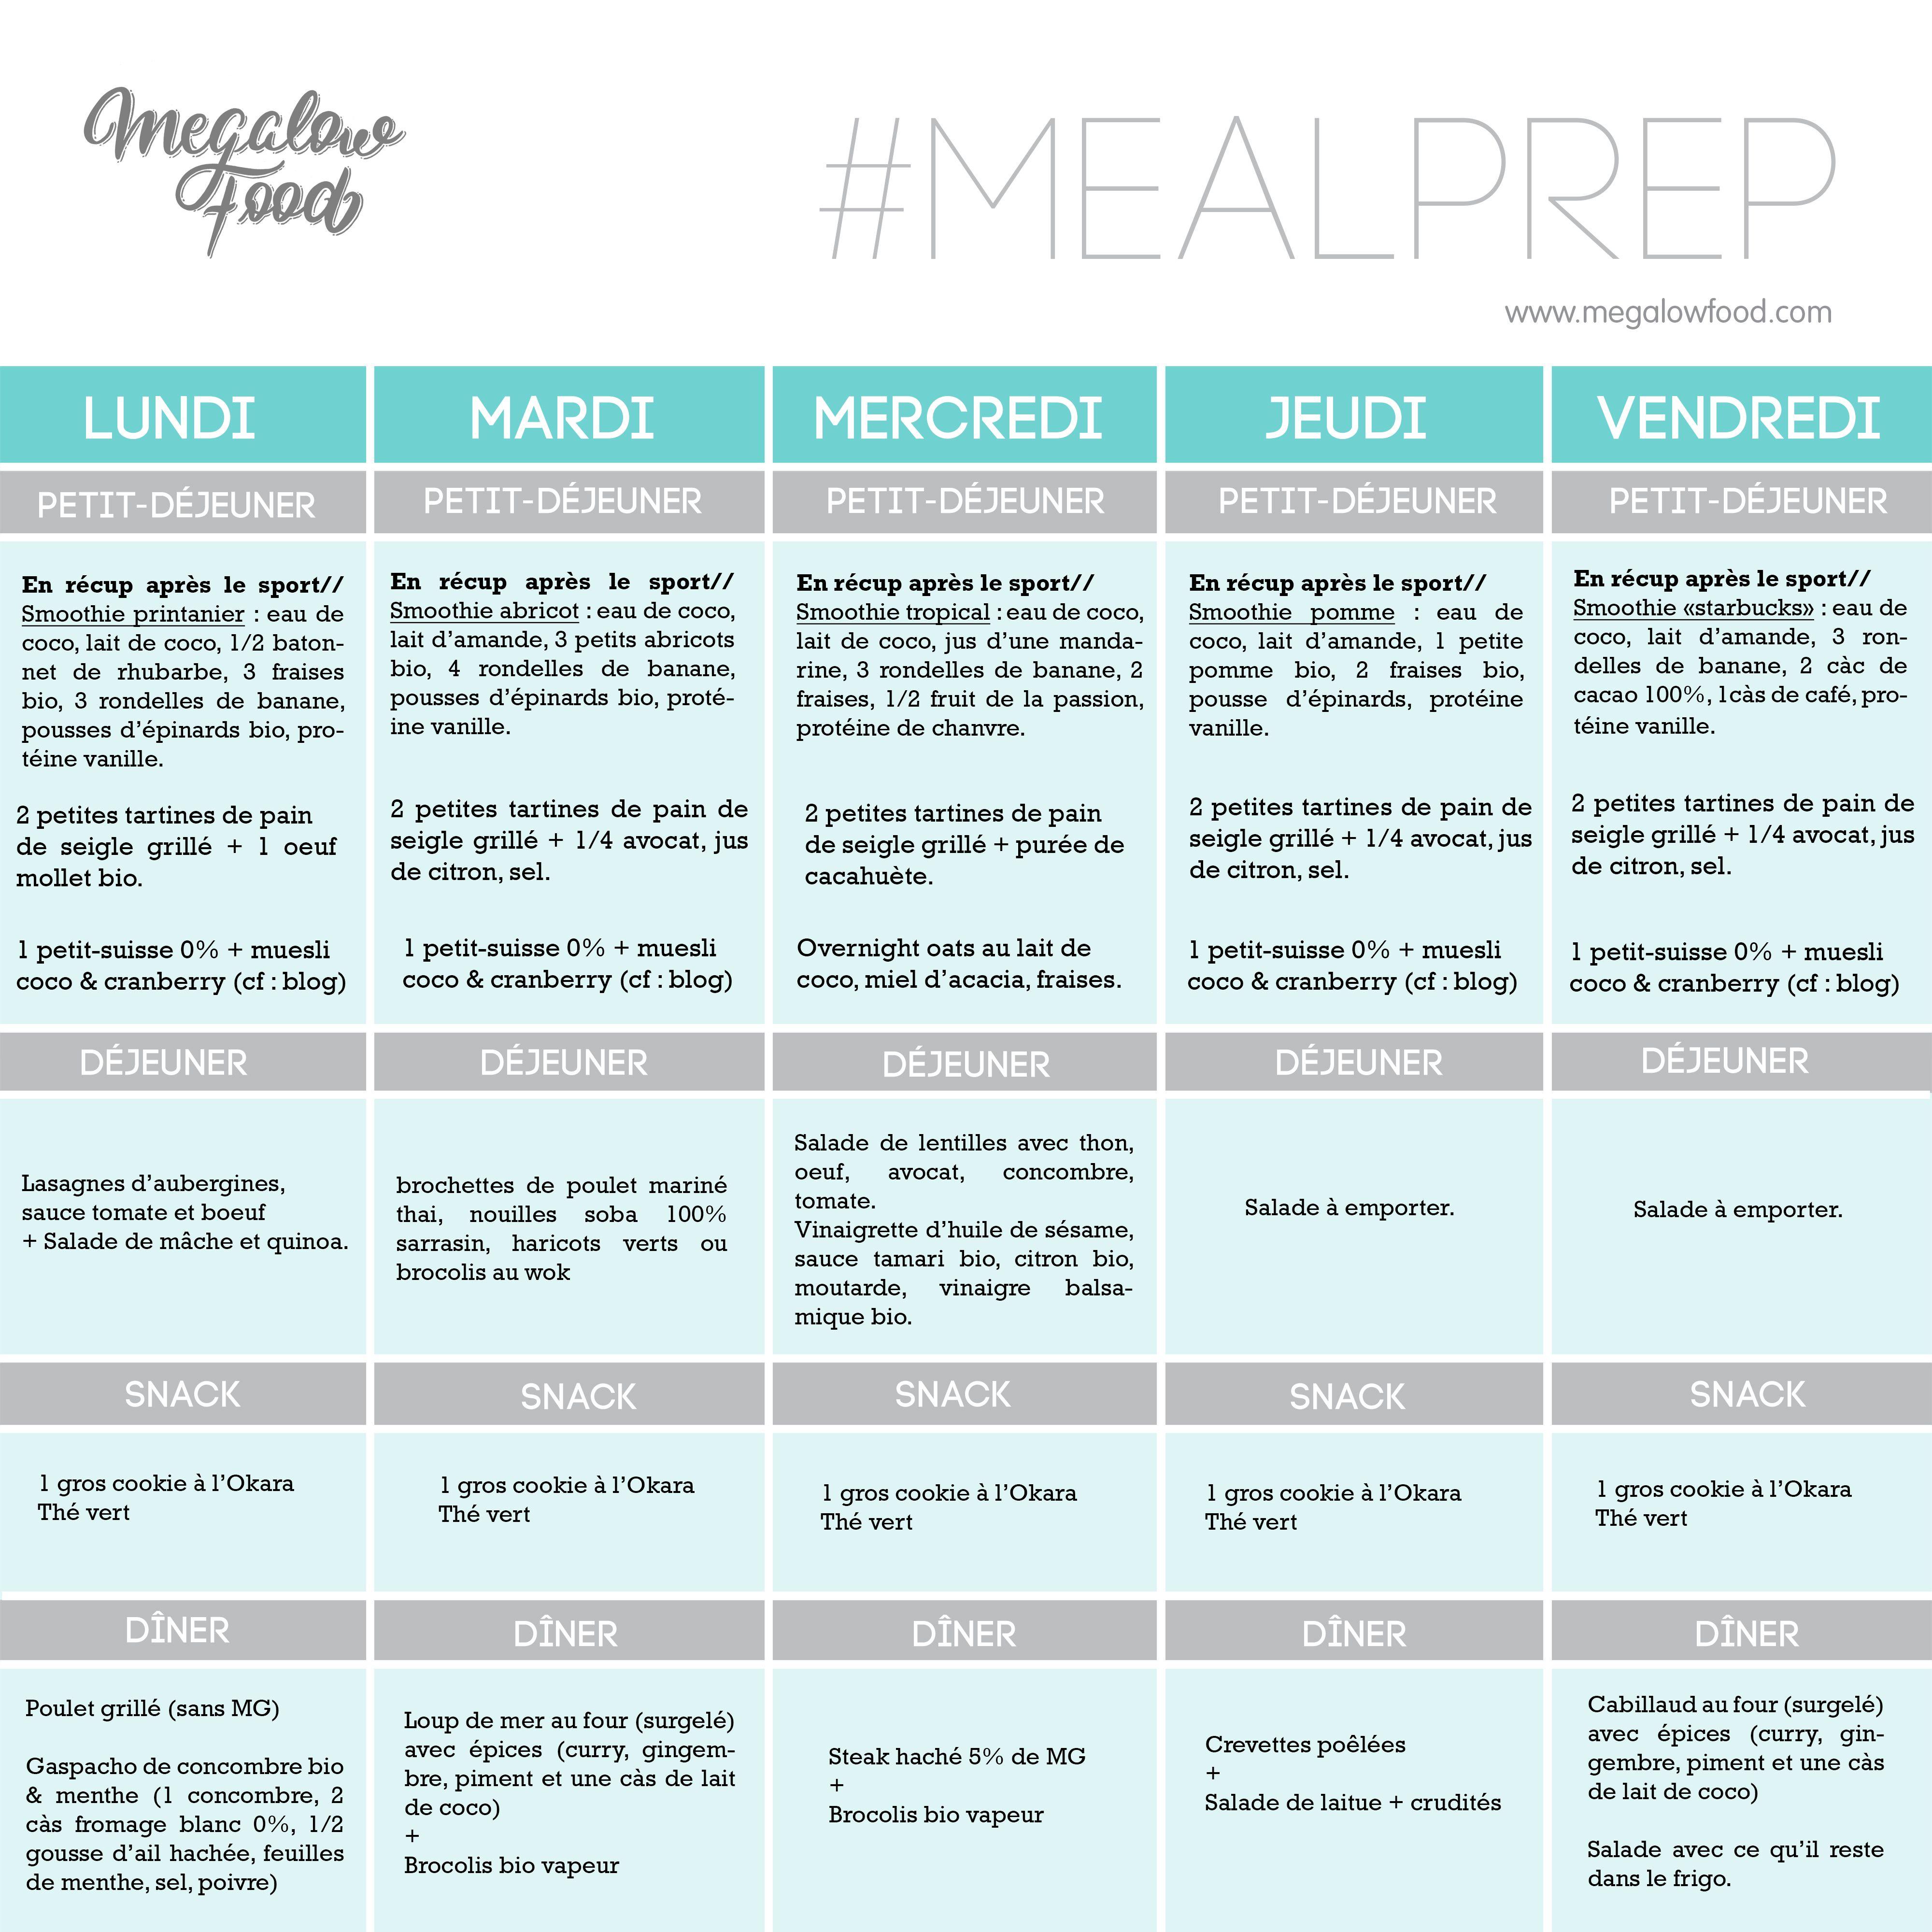 one week of healthy lowcarb meal plan une semaine de repas sains et ig bas megalowfood bien. Black Bedroom Furniture Sets. Home Design Ideas